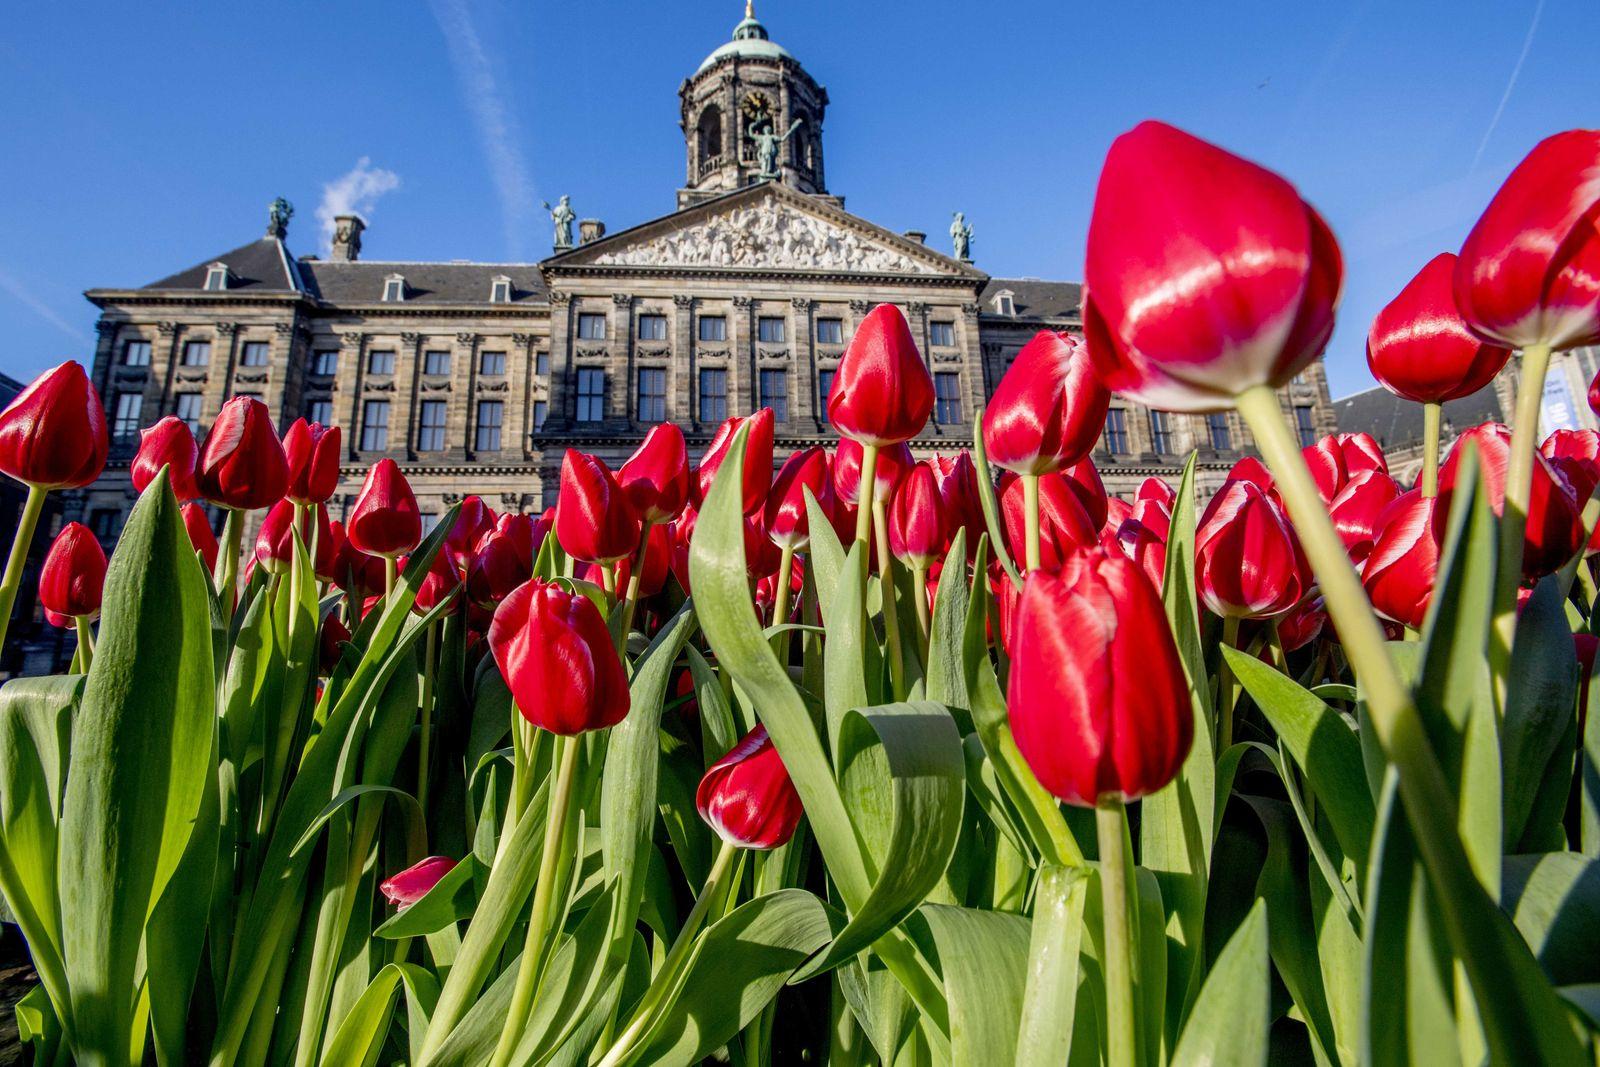 Free tulips in Amsterdam, Netherlands - 21 Jan 2017